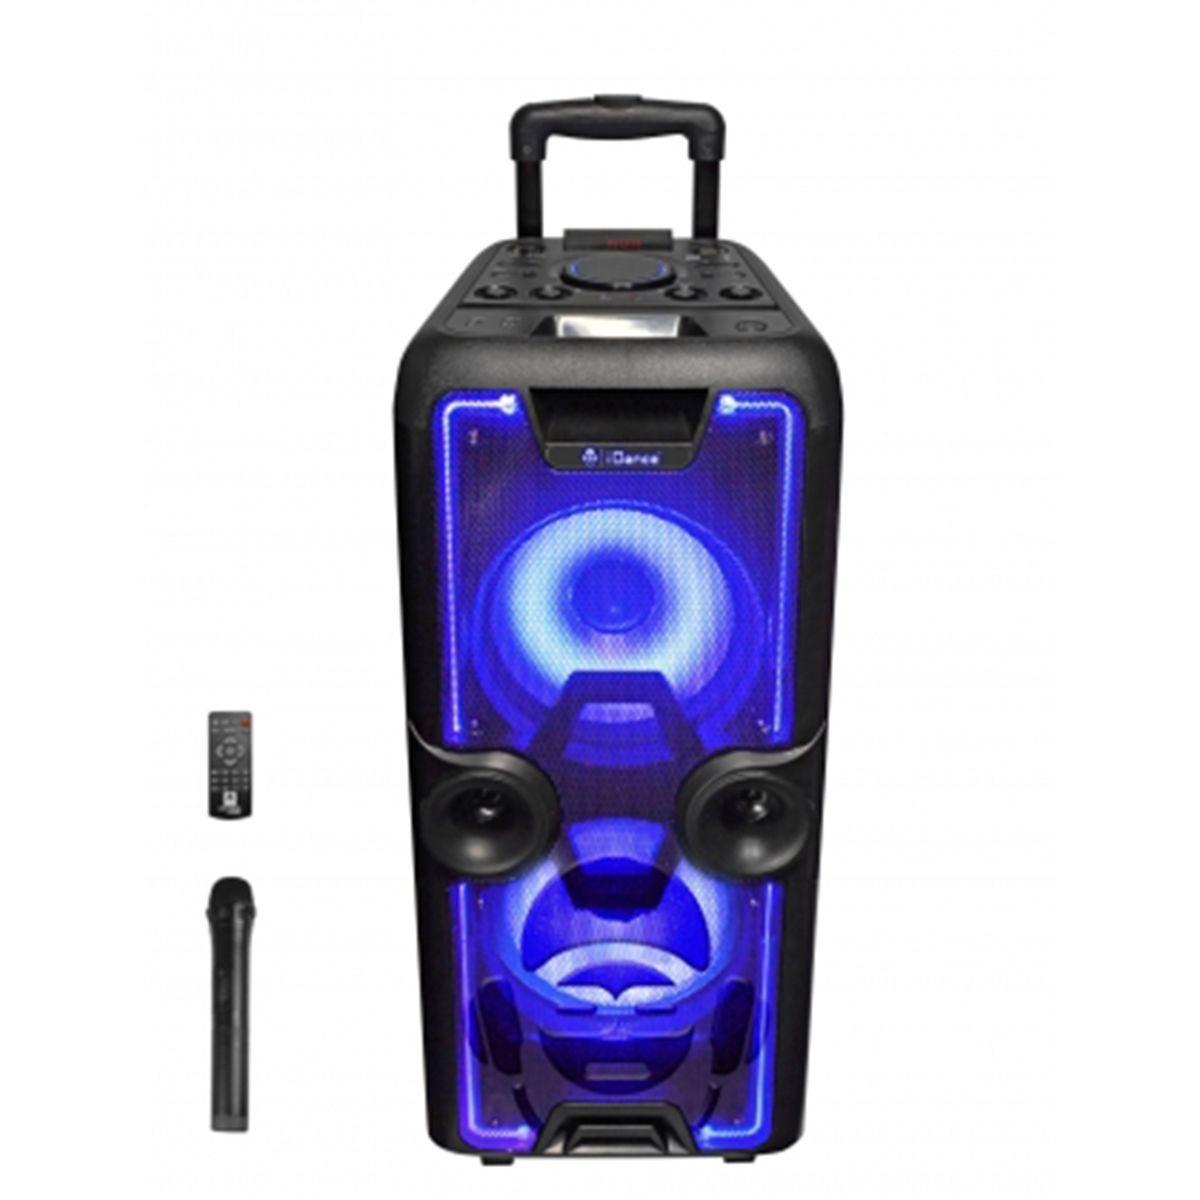 iDance Megabox 2000 Portable Bluetooth Party System